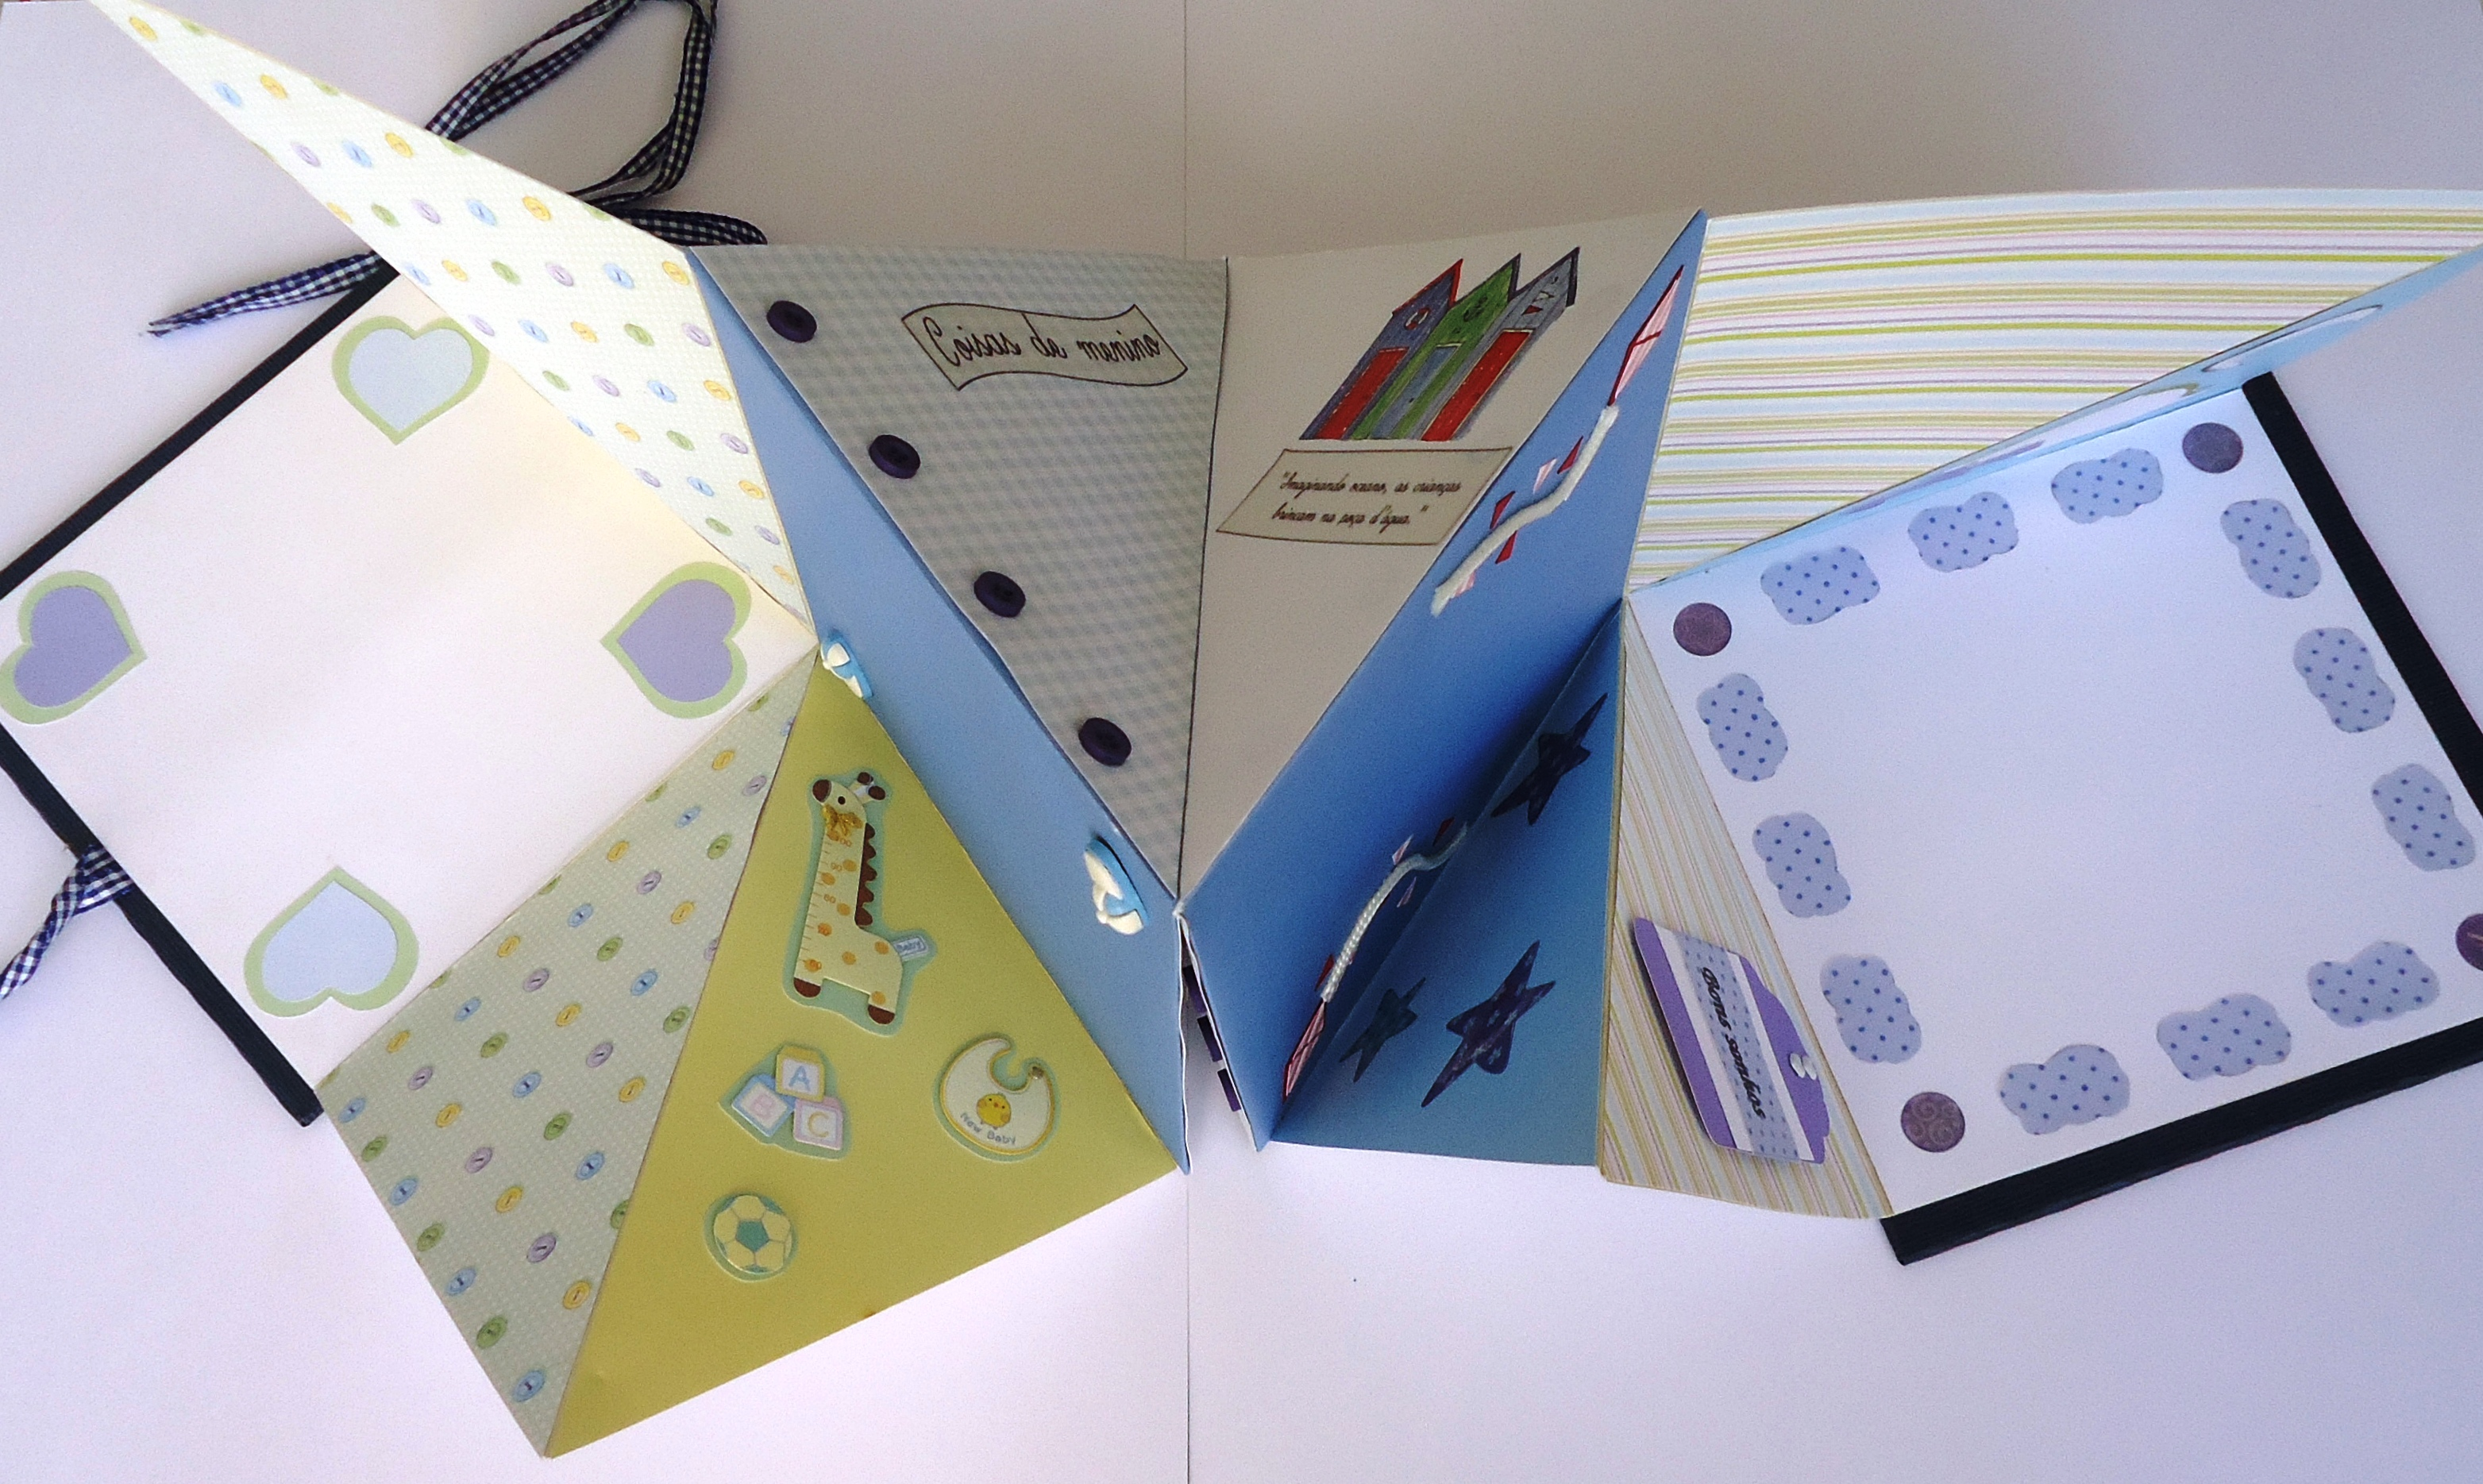 Álbum Dobradura em origami Baby Boy | FUNNY PAPER | Elo7 - photo#47